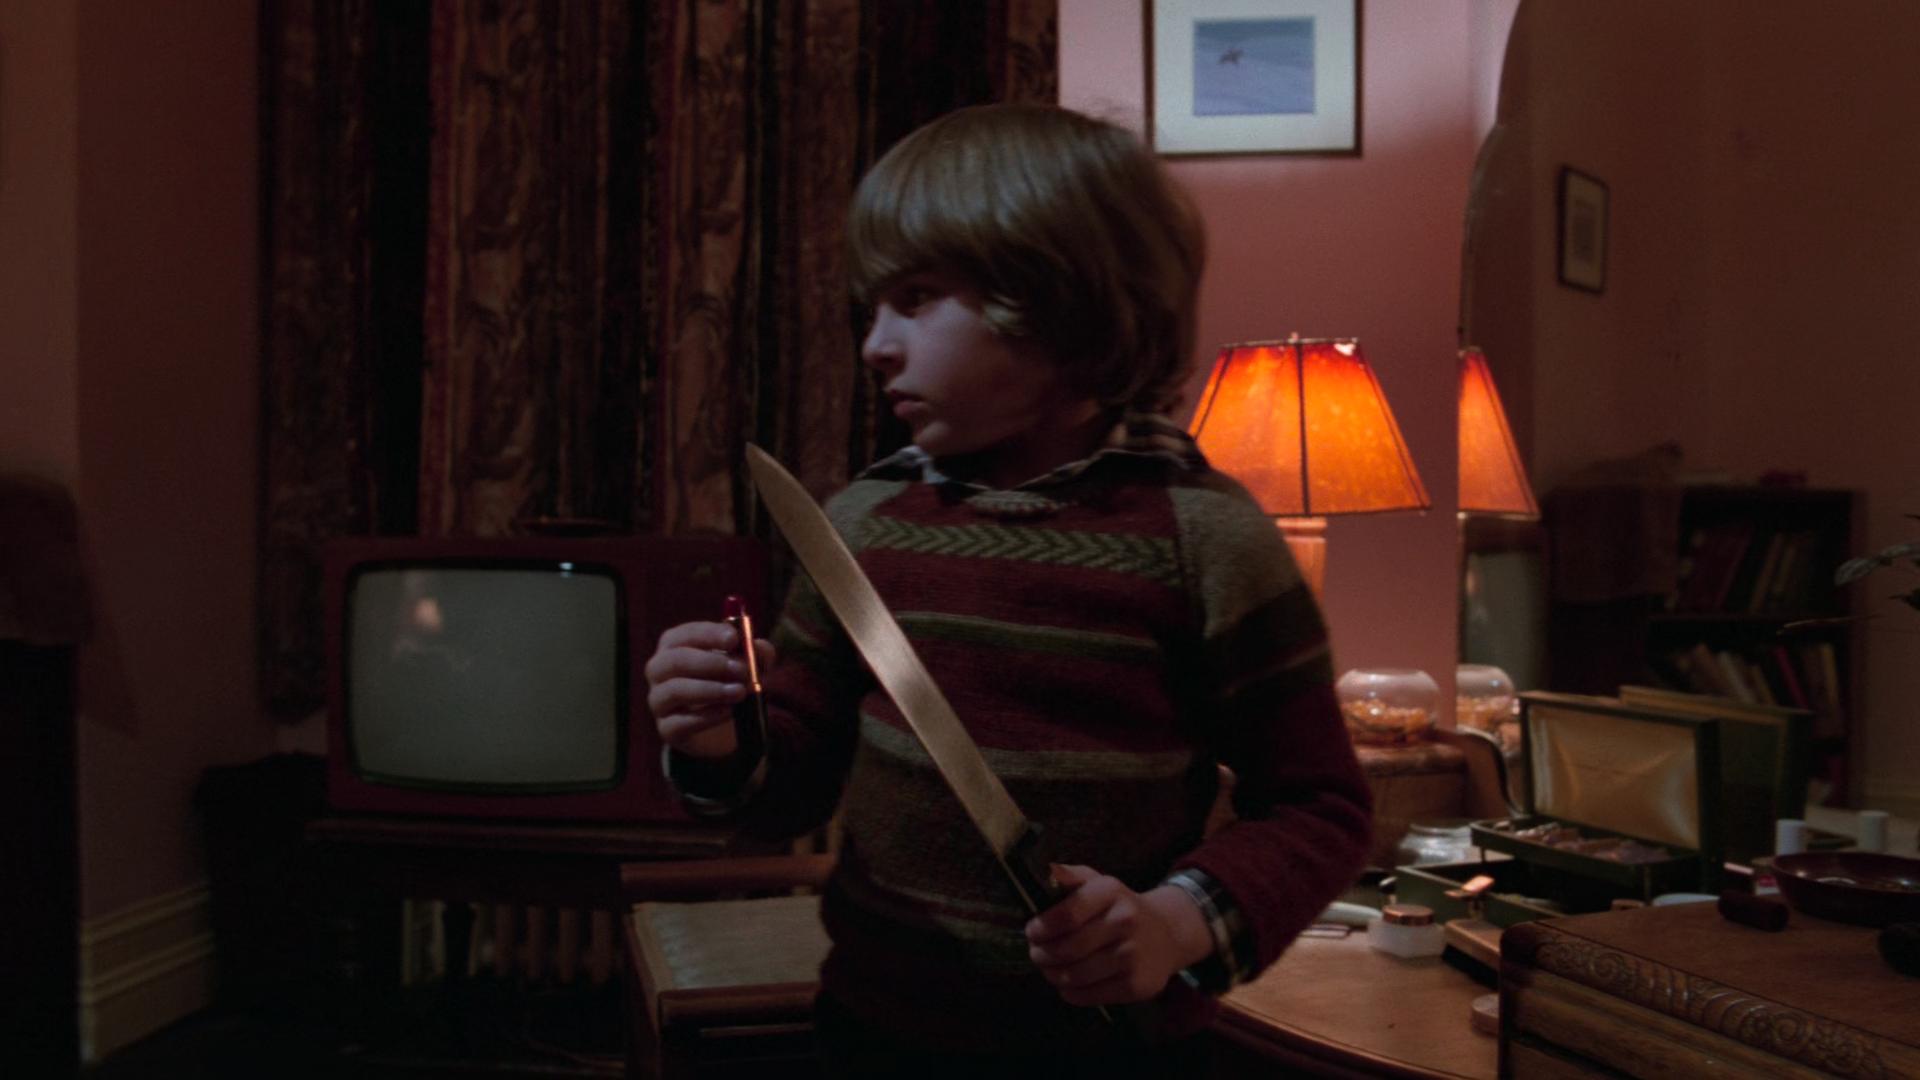 Cinnet | The Shining | 1980 | BDRip | XviD | Türkçe Dublaj | m720p - m1080p | BluRay | Dual | TR-EN | Tek Link